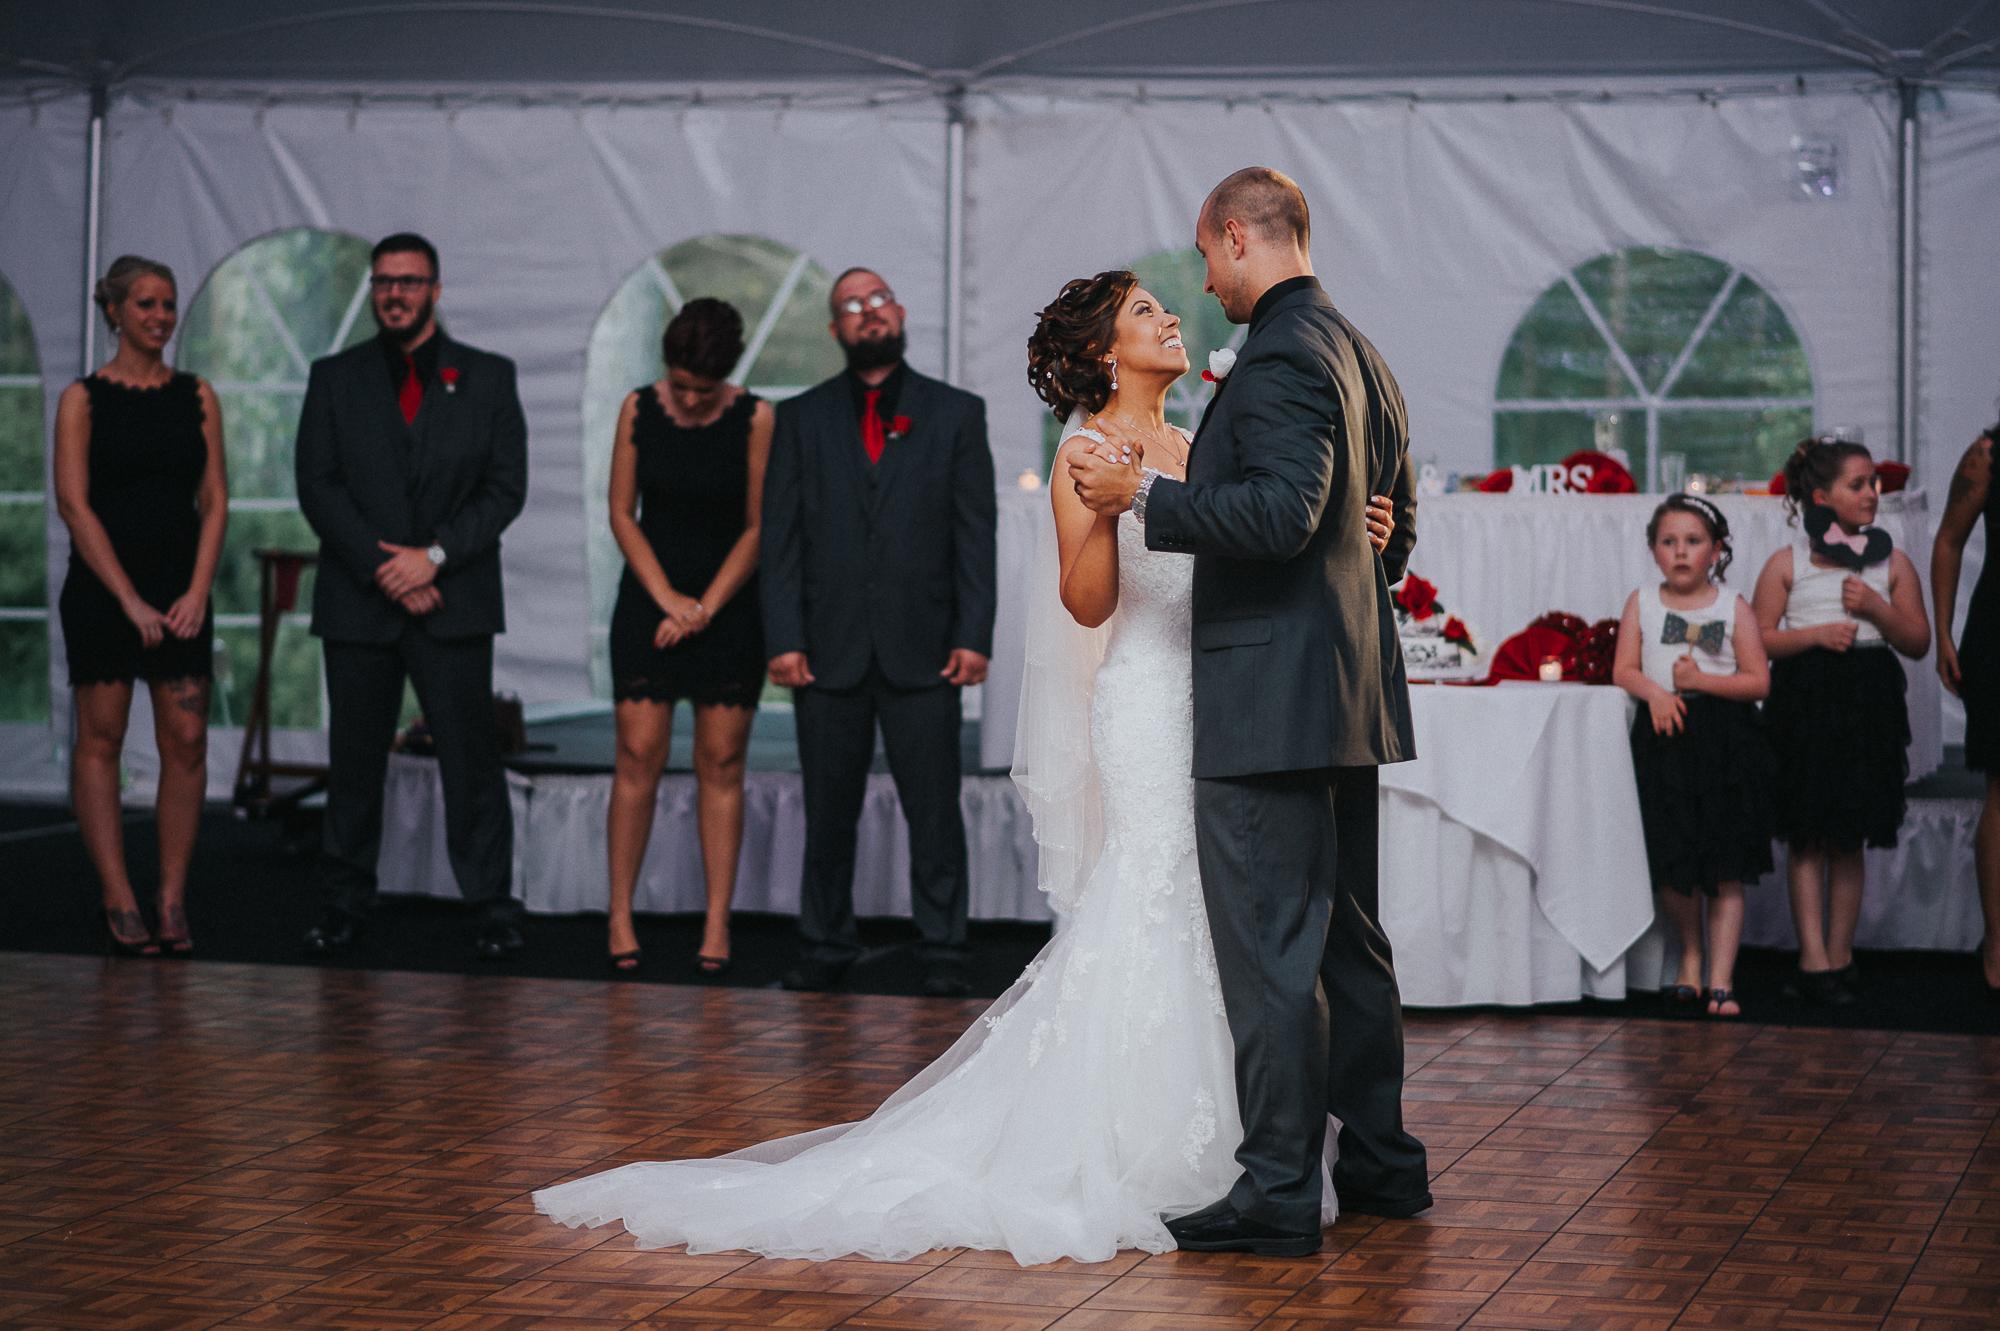 Christina-and-Gene-Wedding-Marla-Rain-Photography-472.jpg